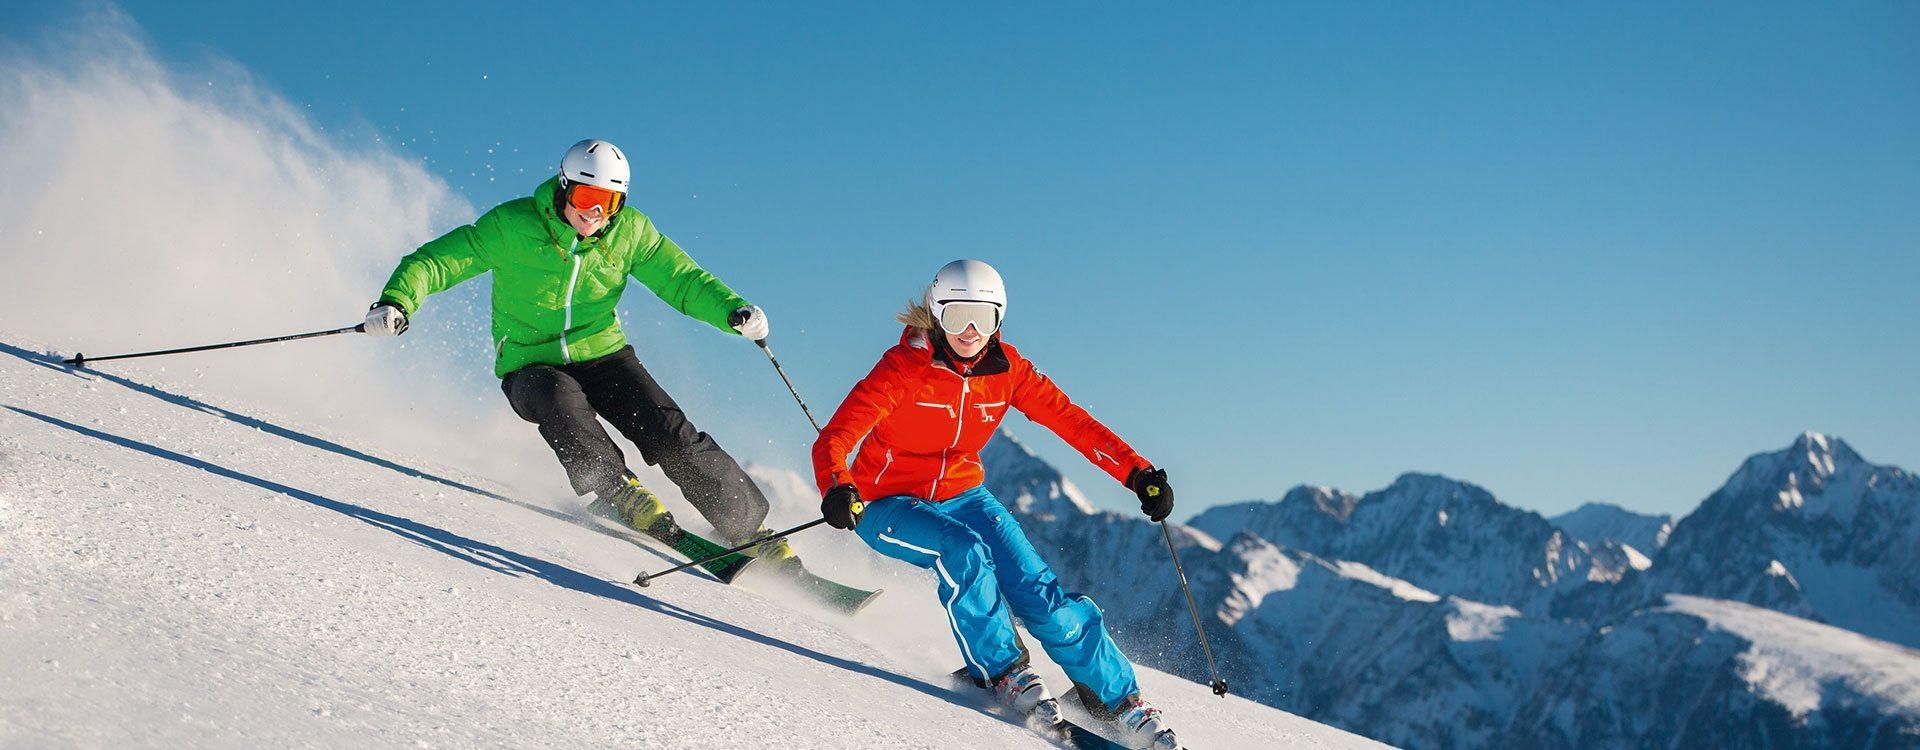 Skiurlaub im Salzburger Lungau, Salzburger Land